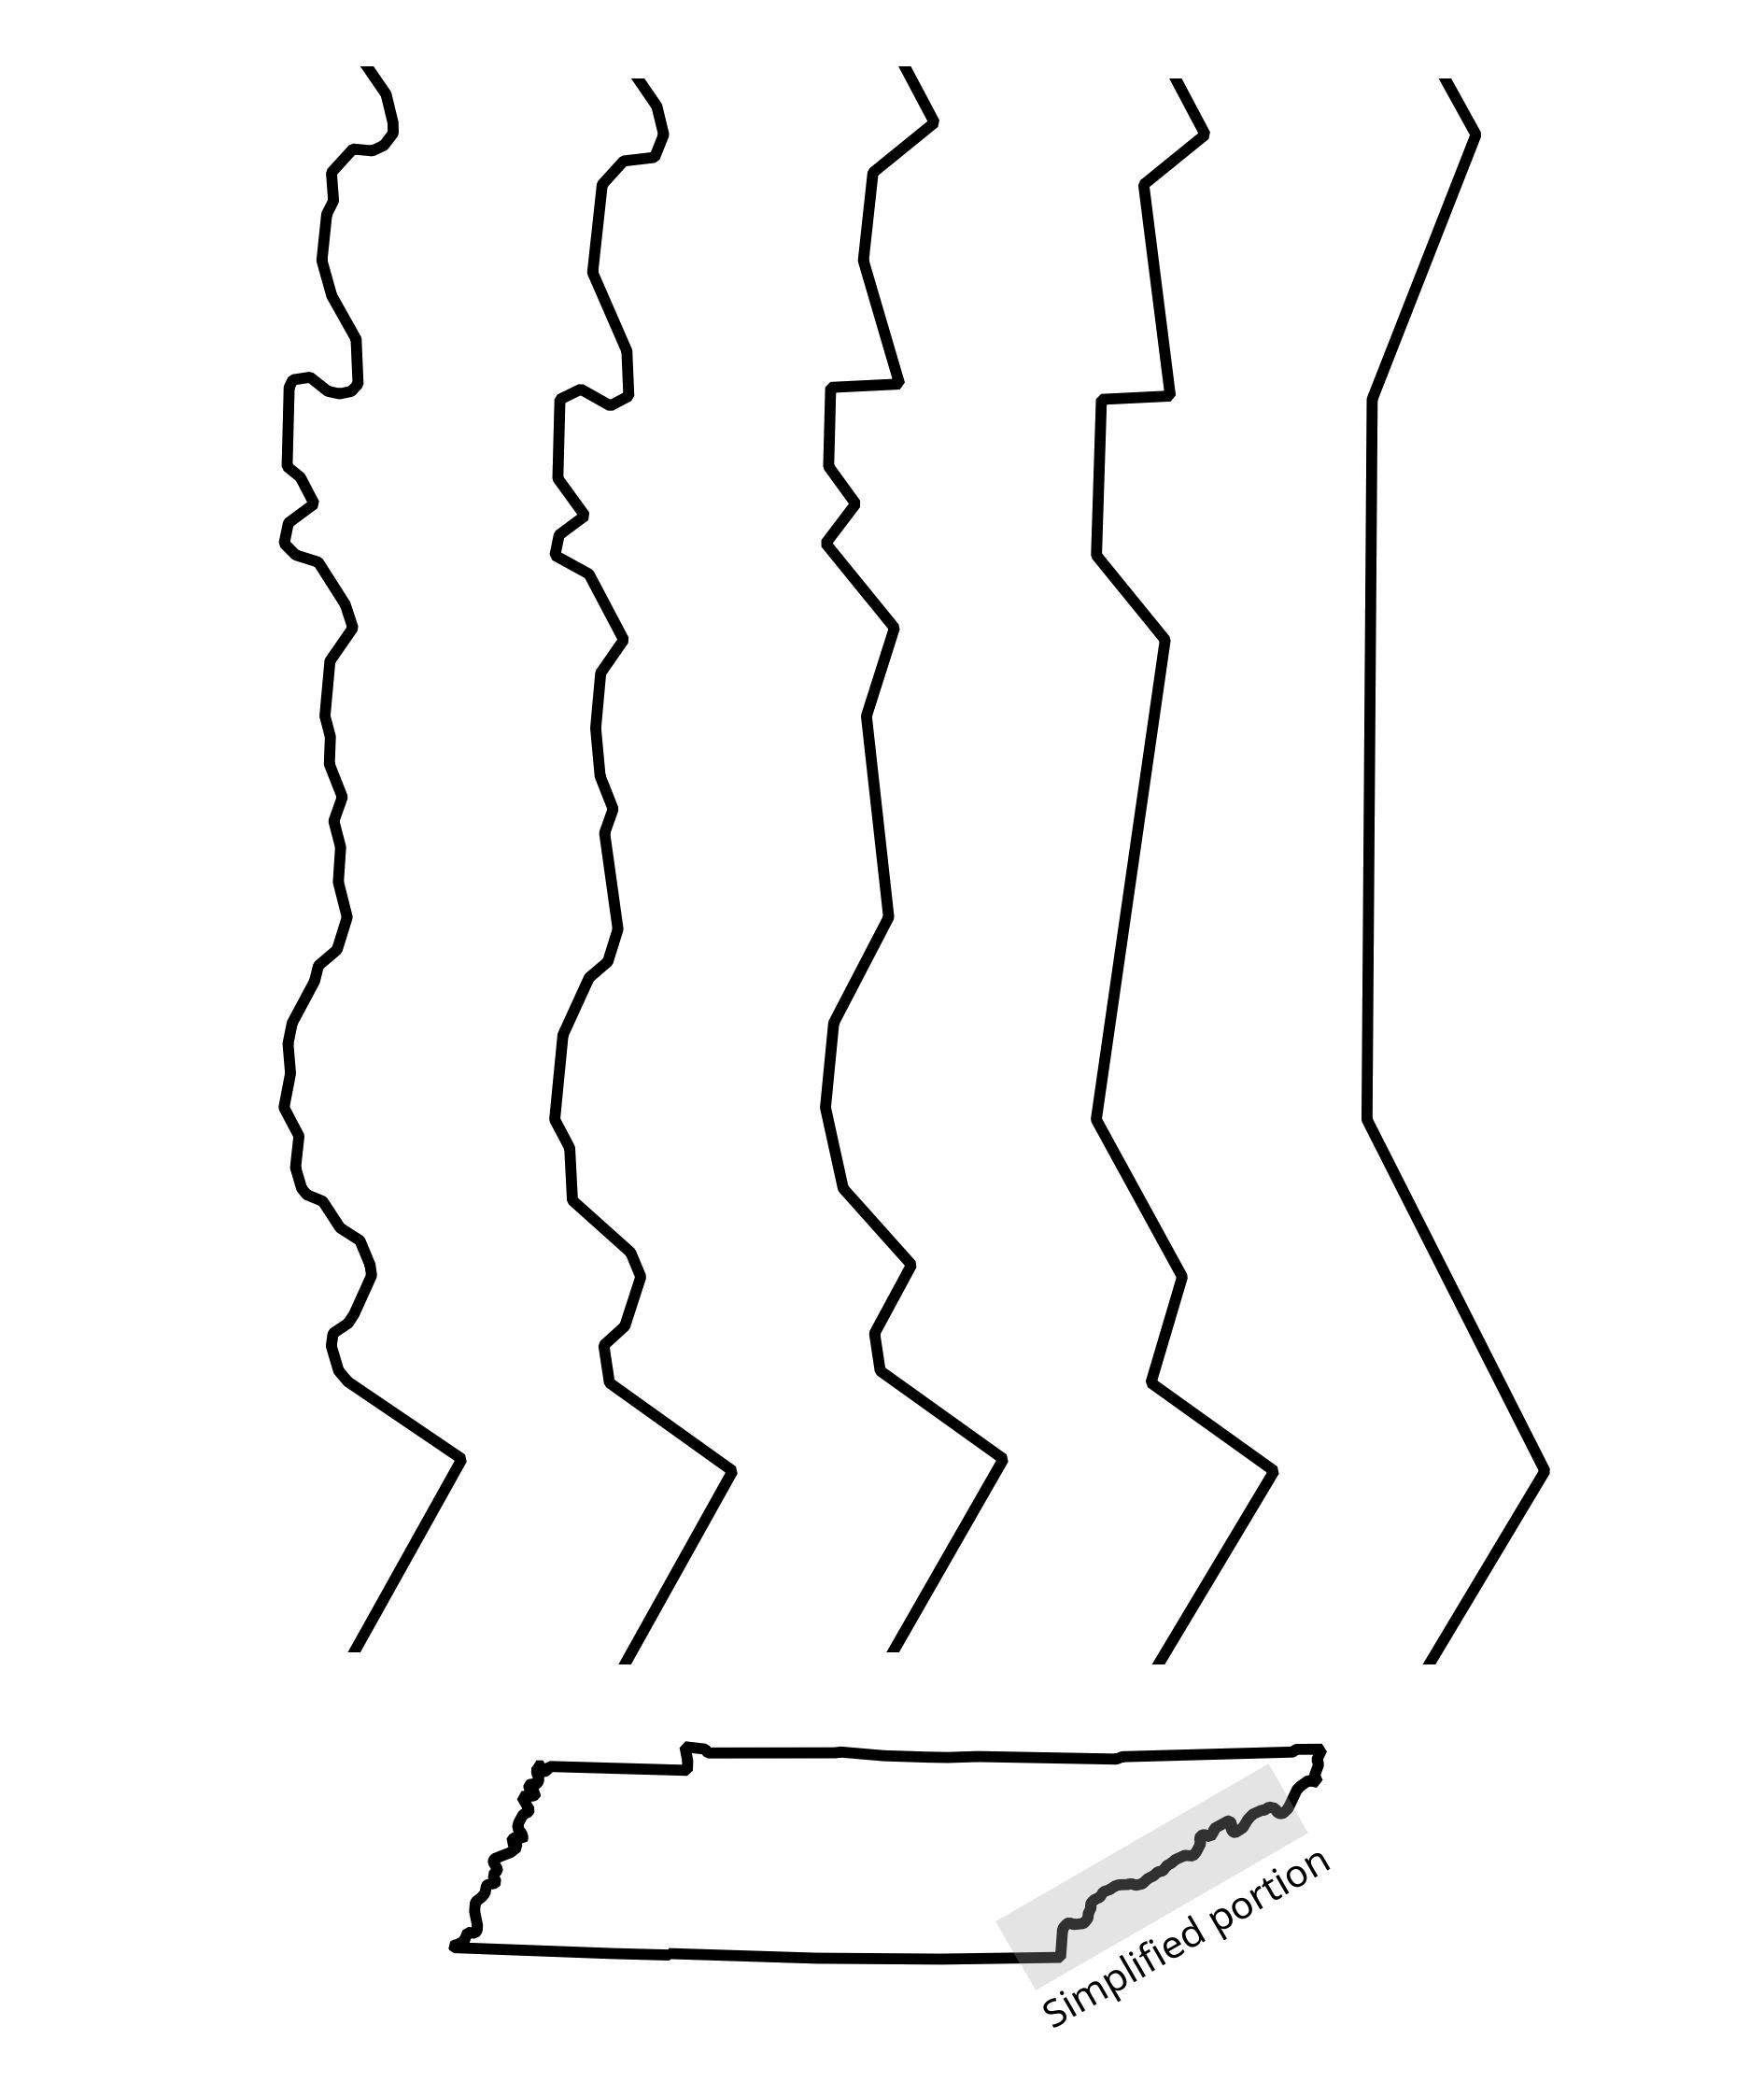 Line simplification